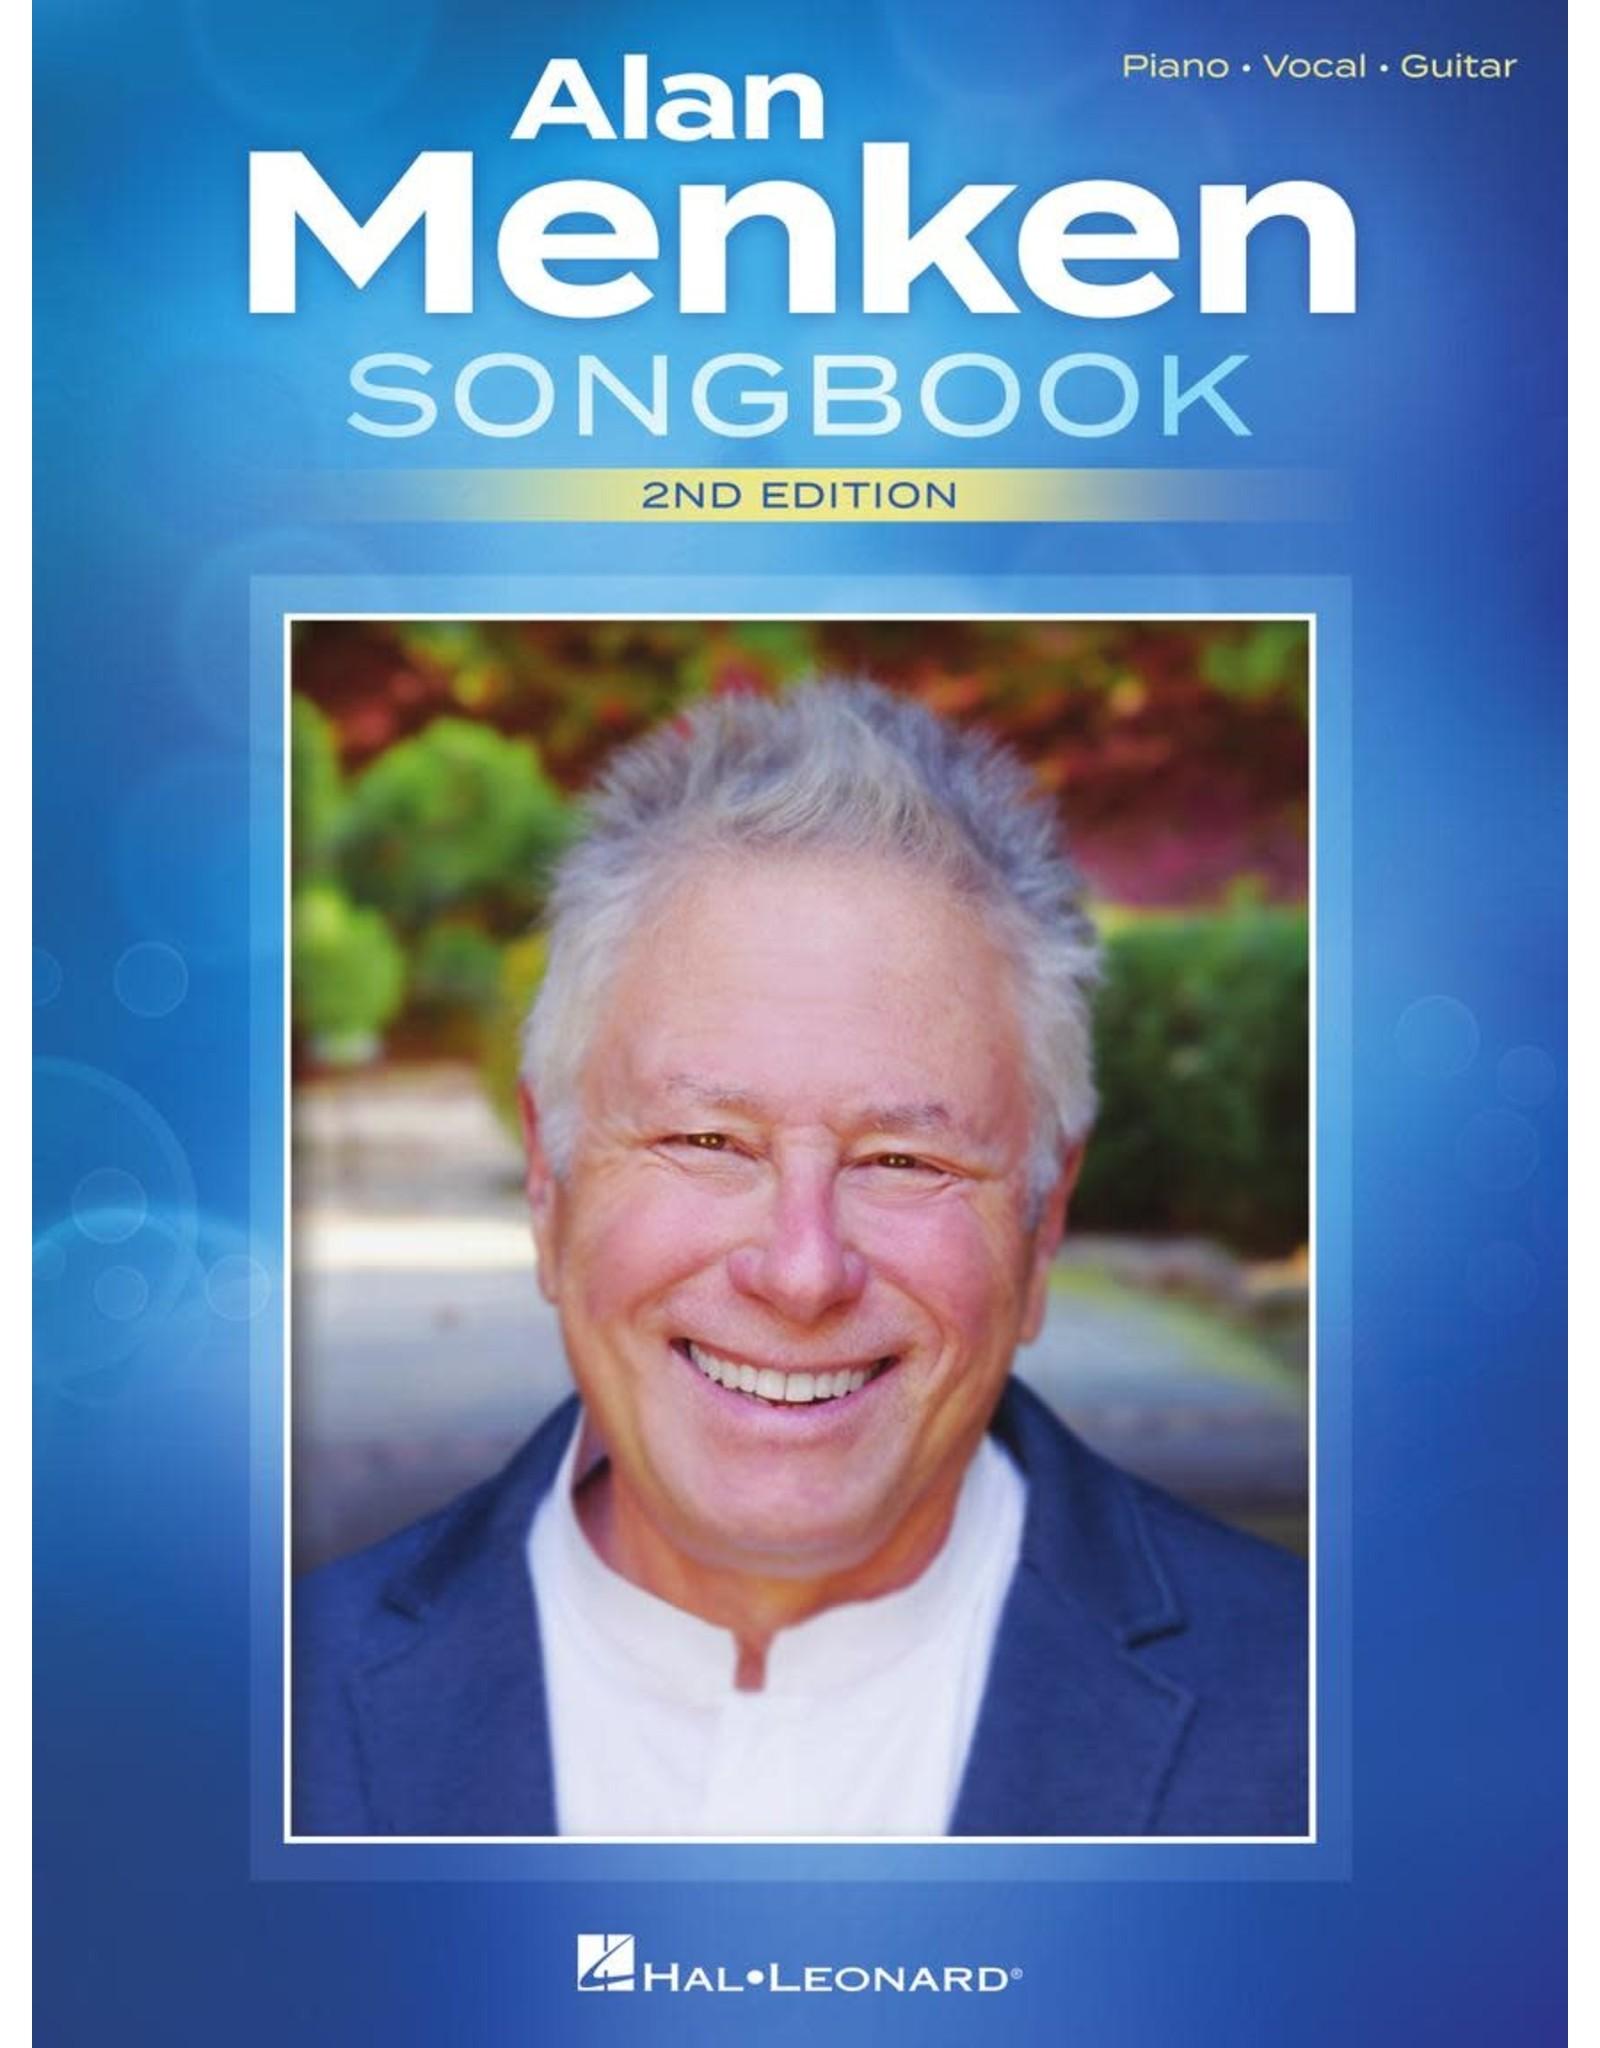 Hal Leonard Alan Menken Songbook - 2nd Edition